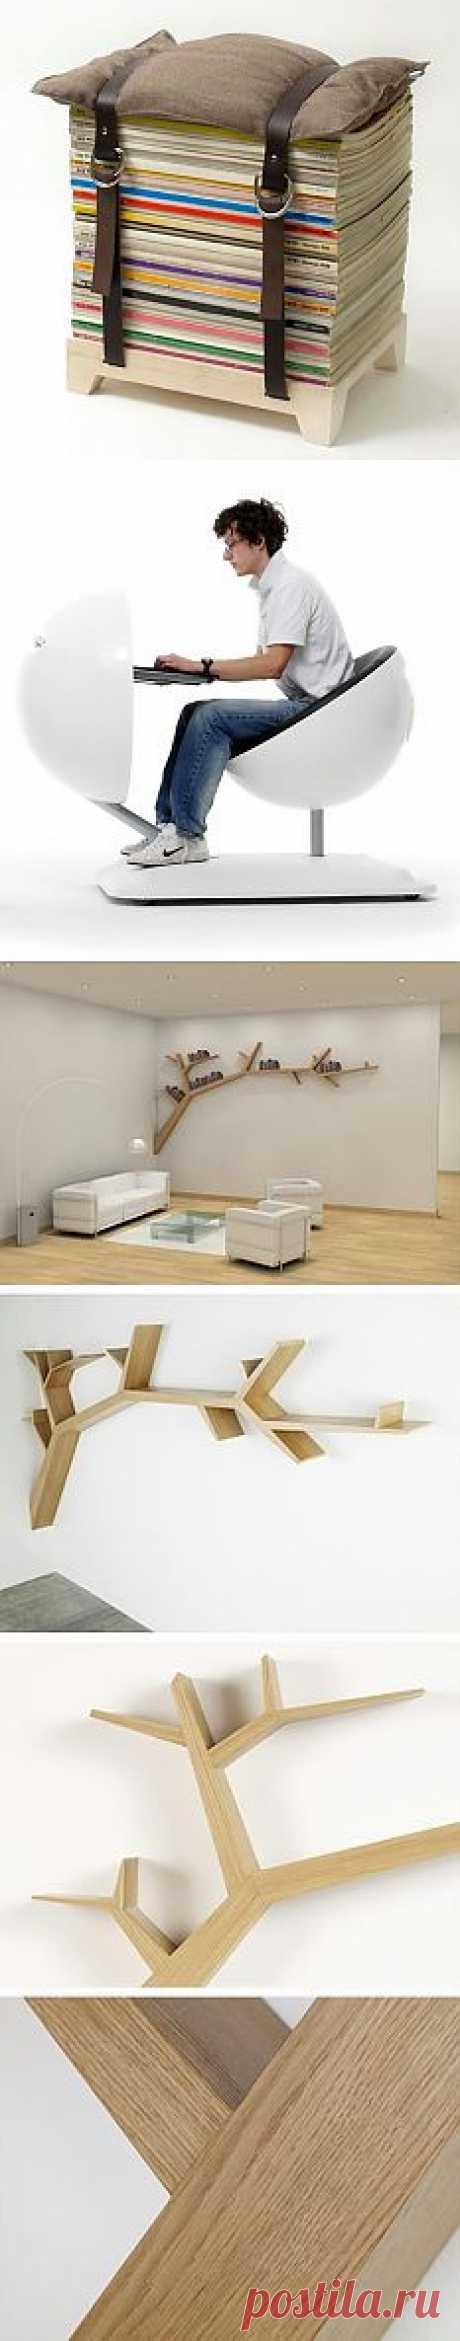 Креативная мебель.